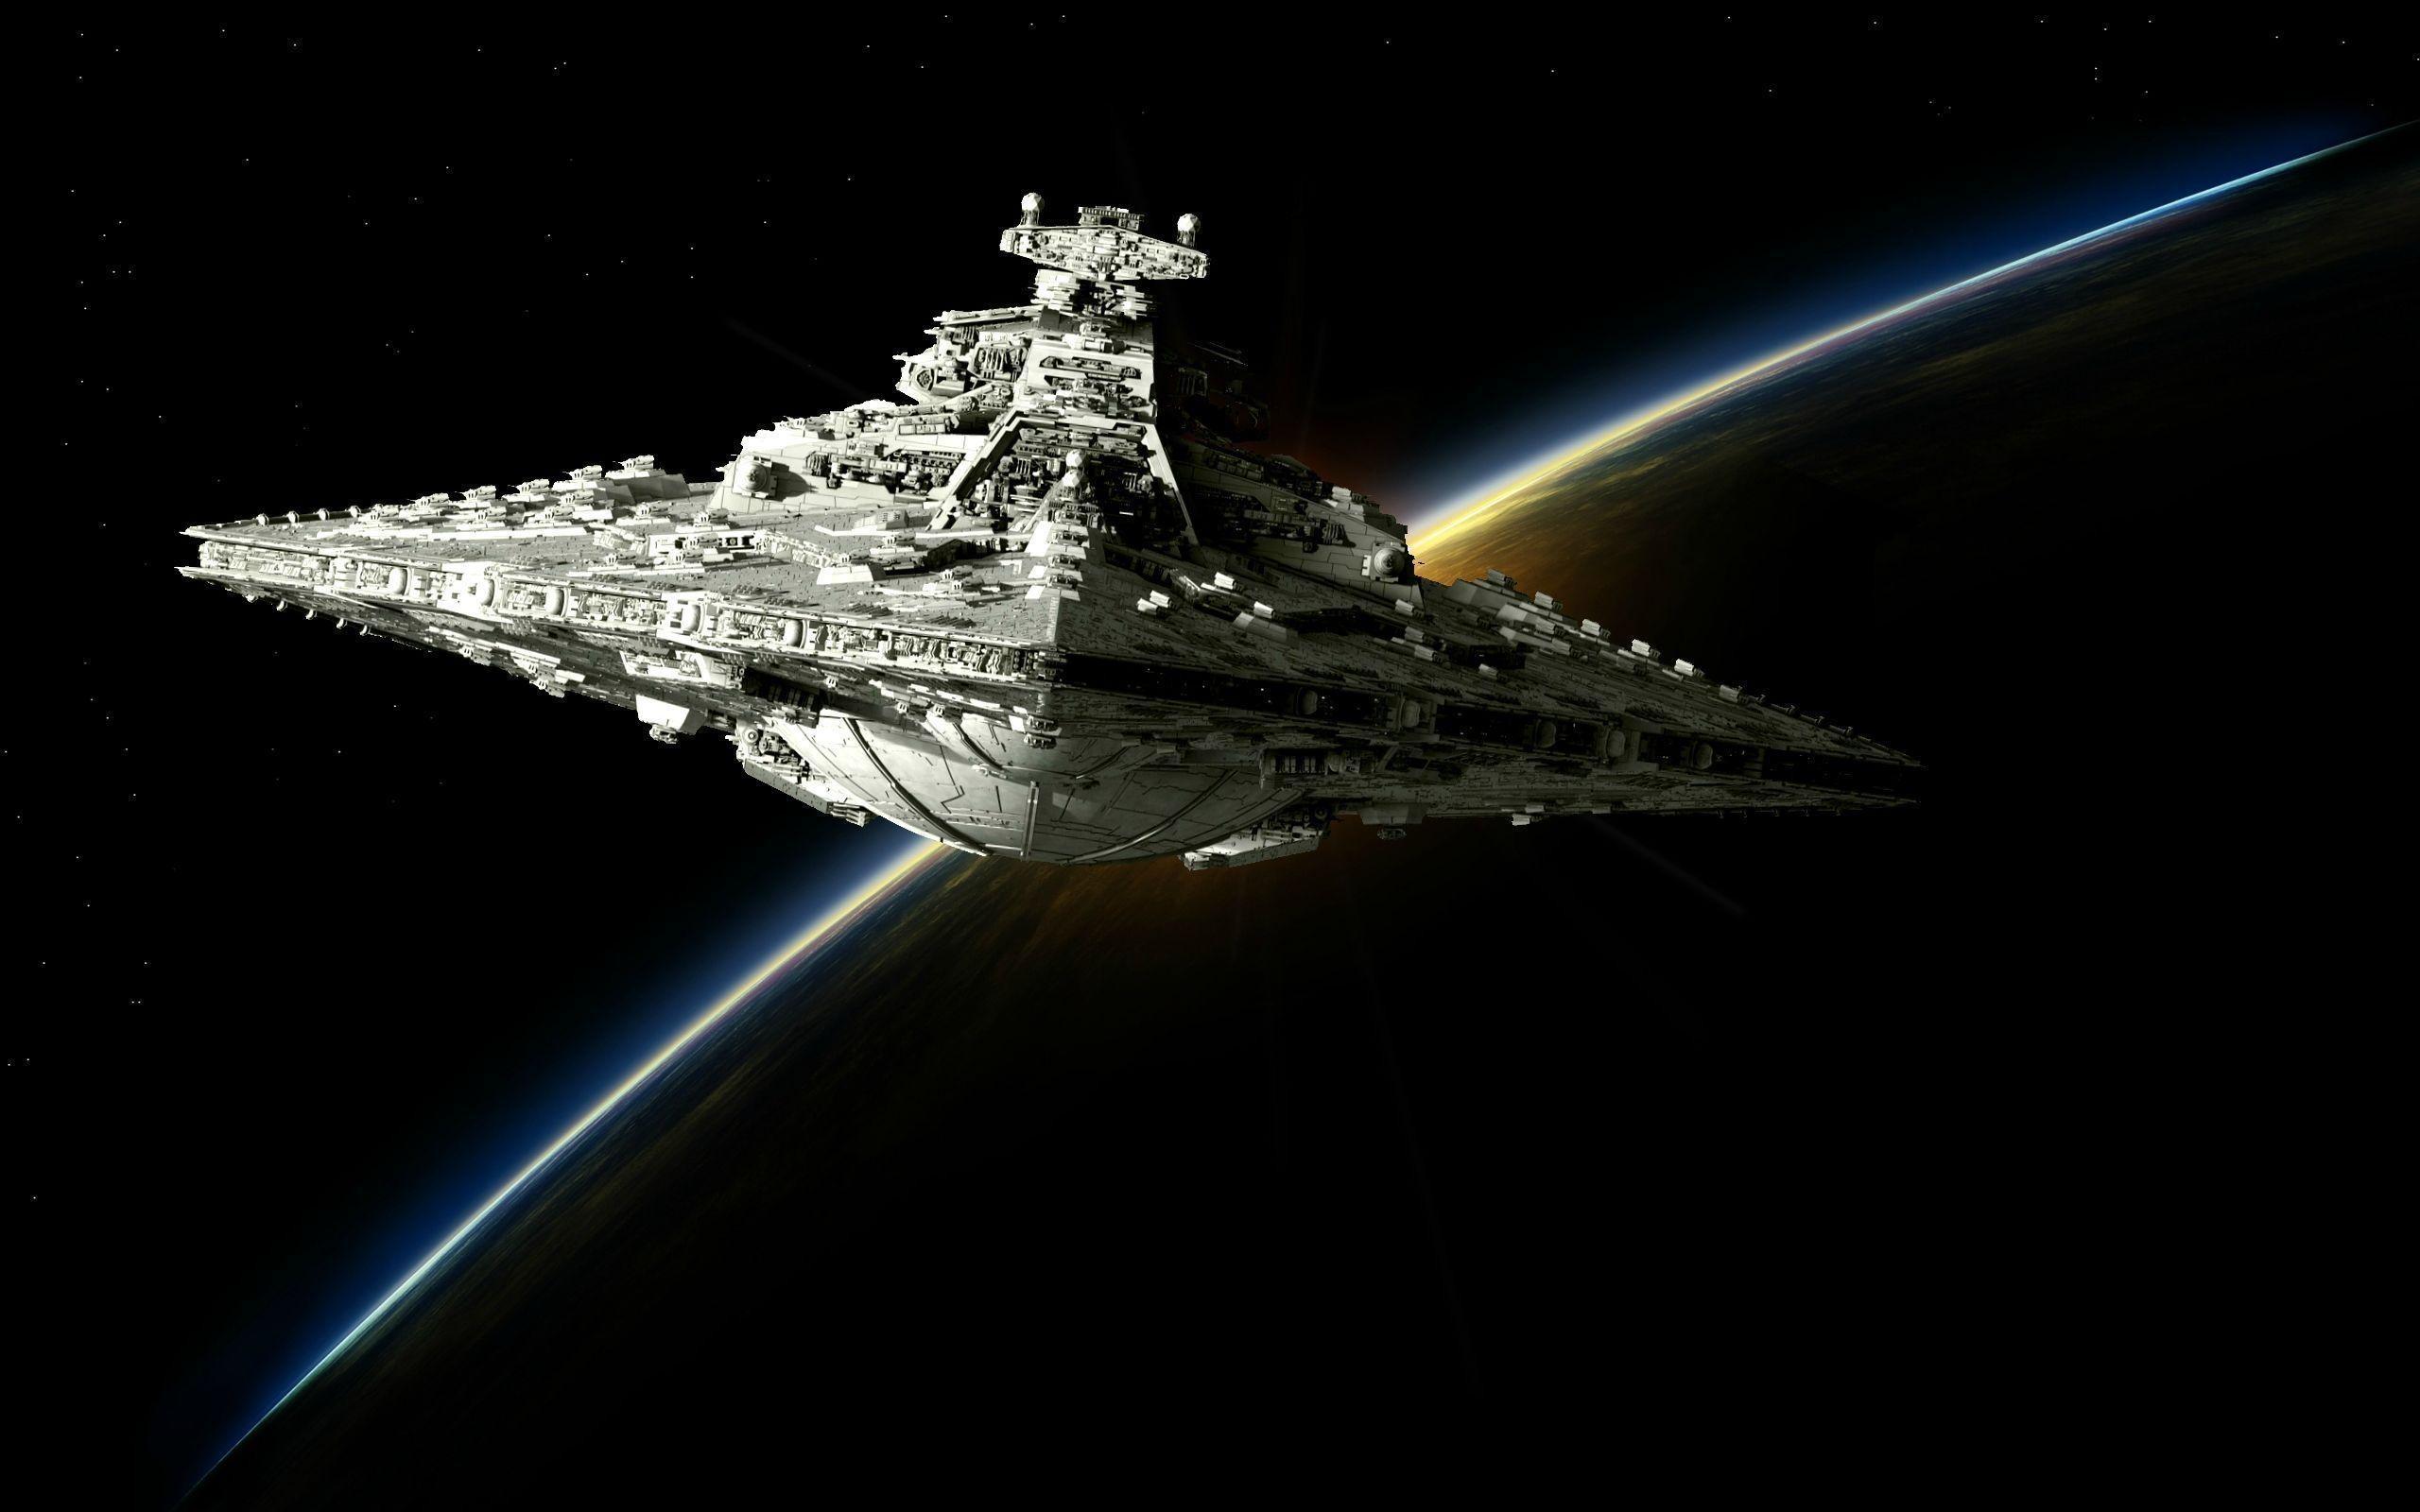 PreviousNext. Previous Image Next Image. star wars super star destroyer  wallpaper …